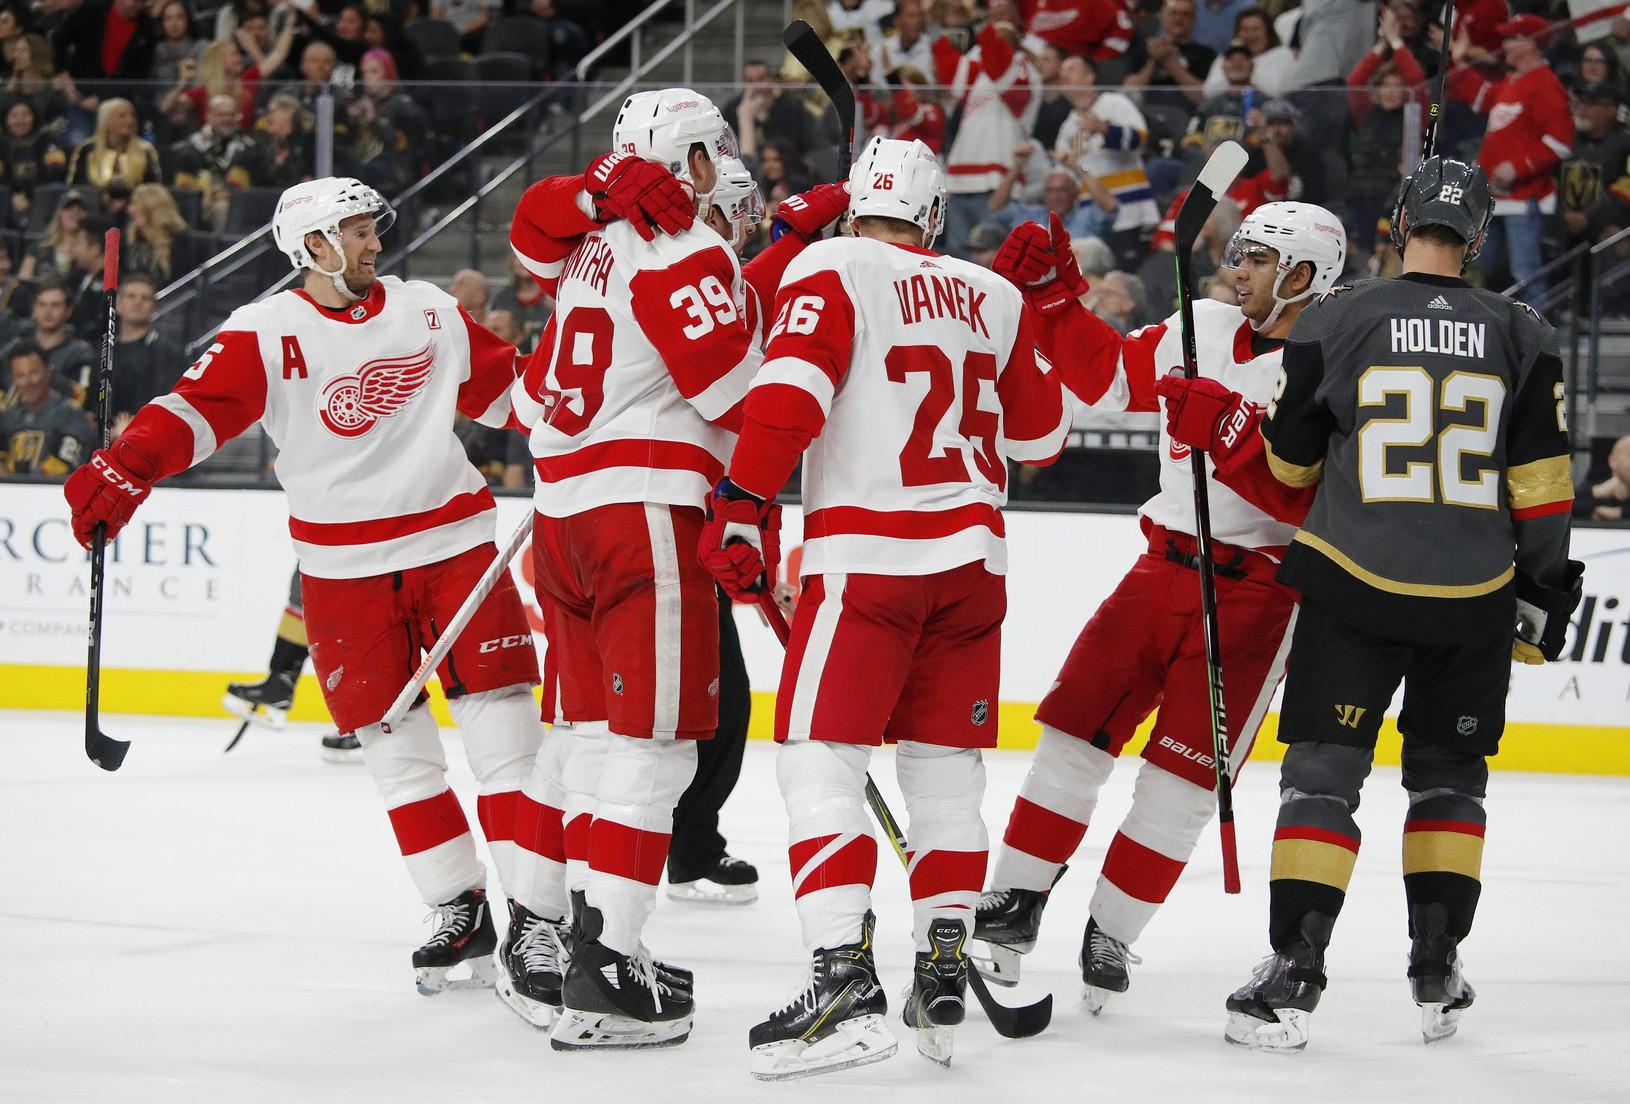 Hráči Detroitu Red Wings